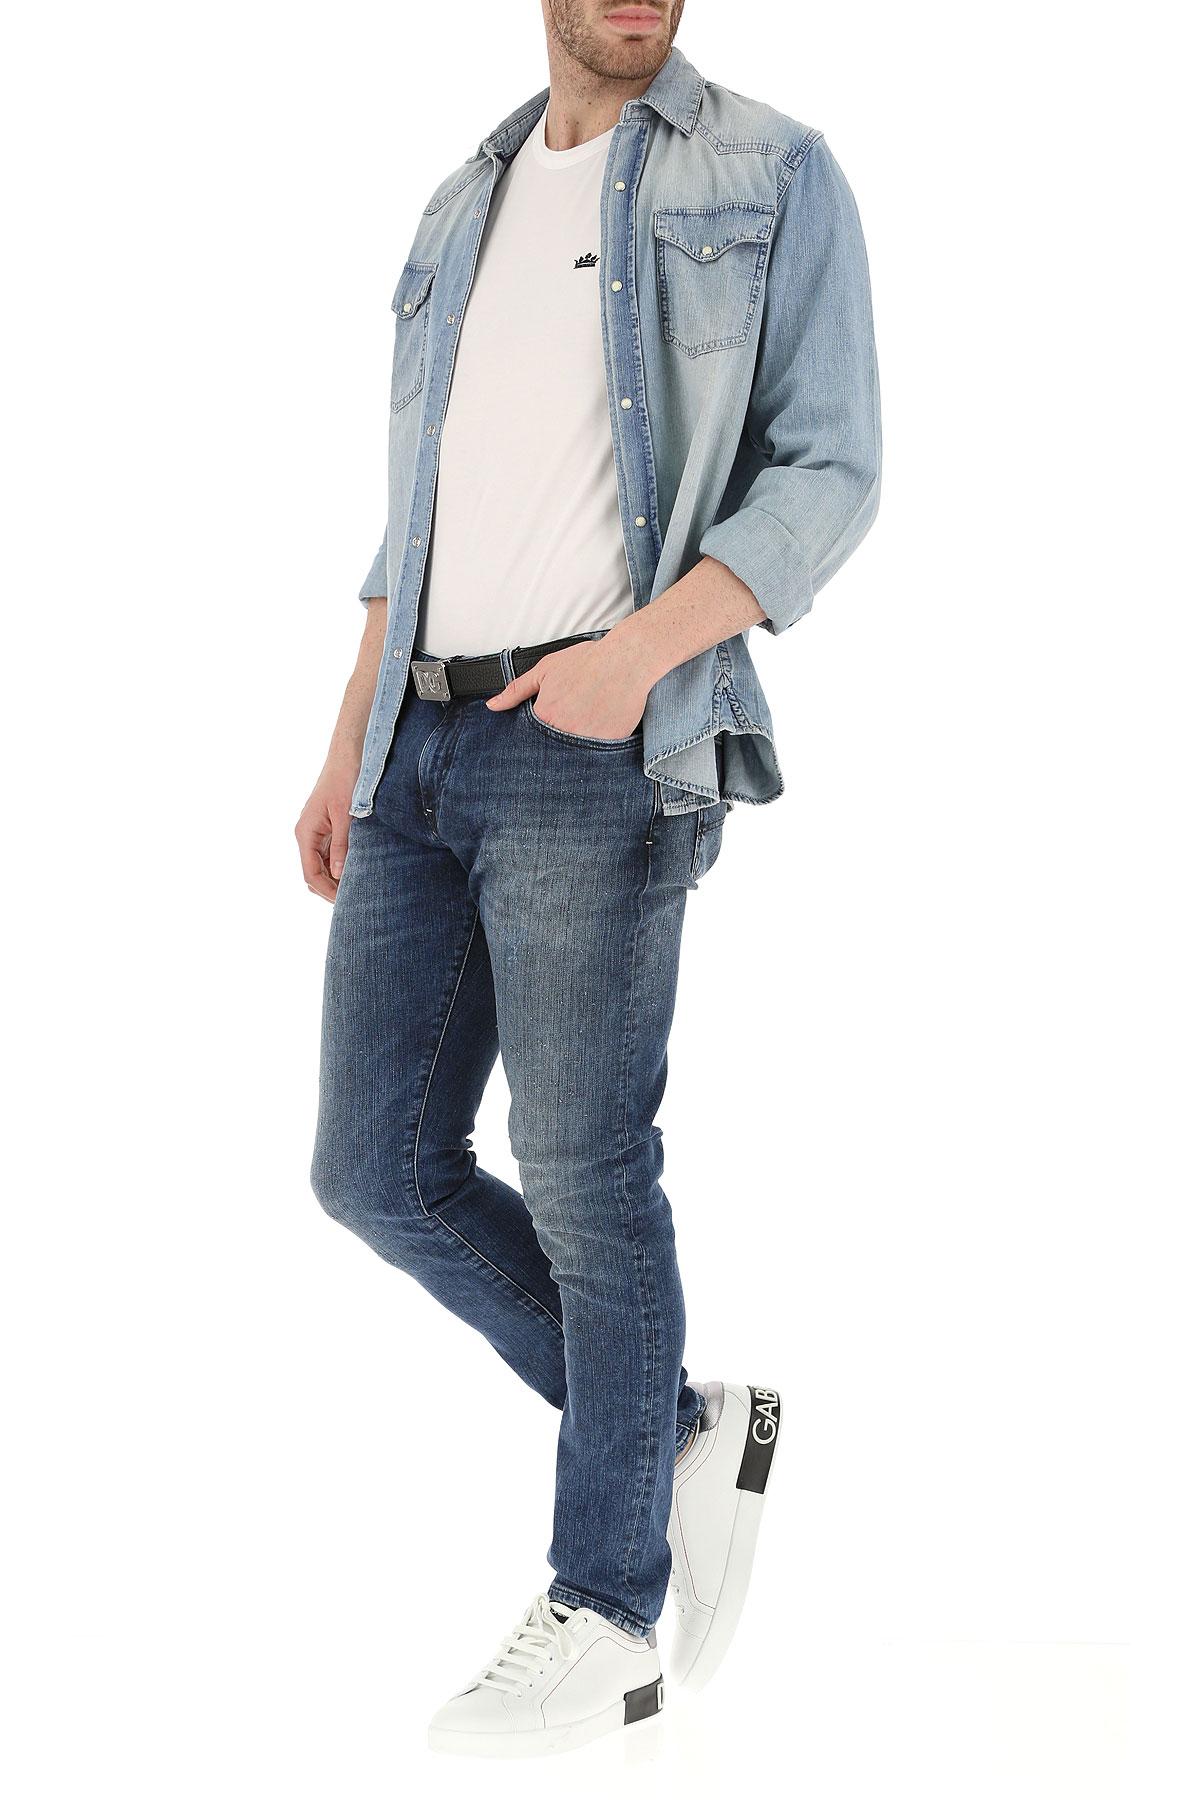 nbsp; Ropa Para Dolce Gabbana Blanco 2019 verano Hombres amp; Primavera UfWwWSqOz